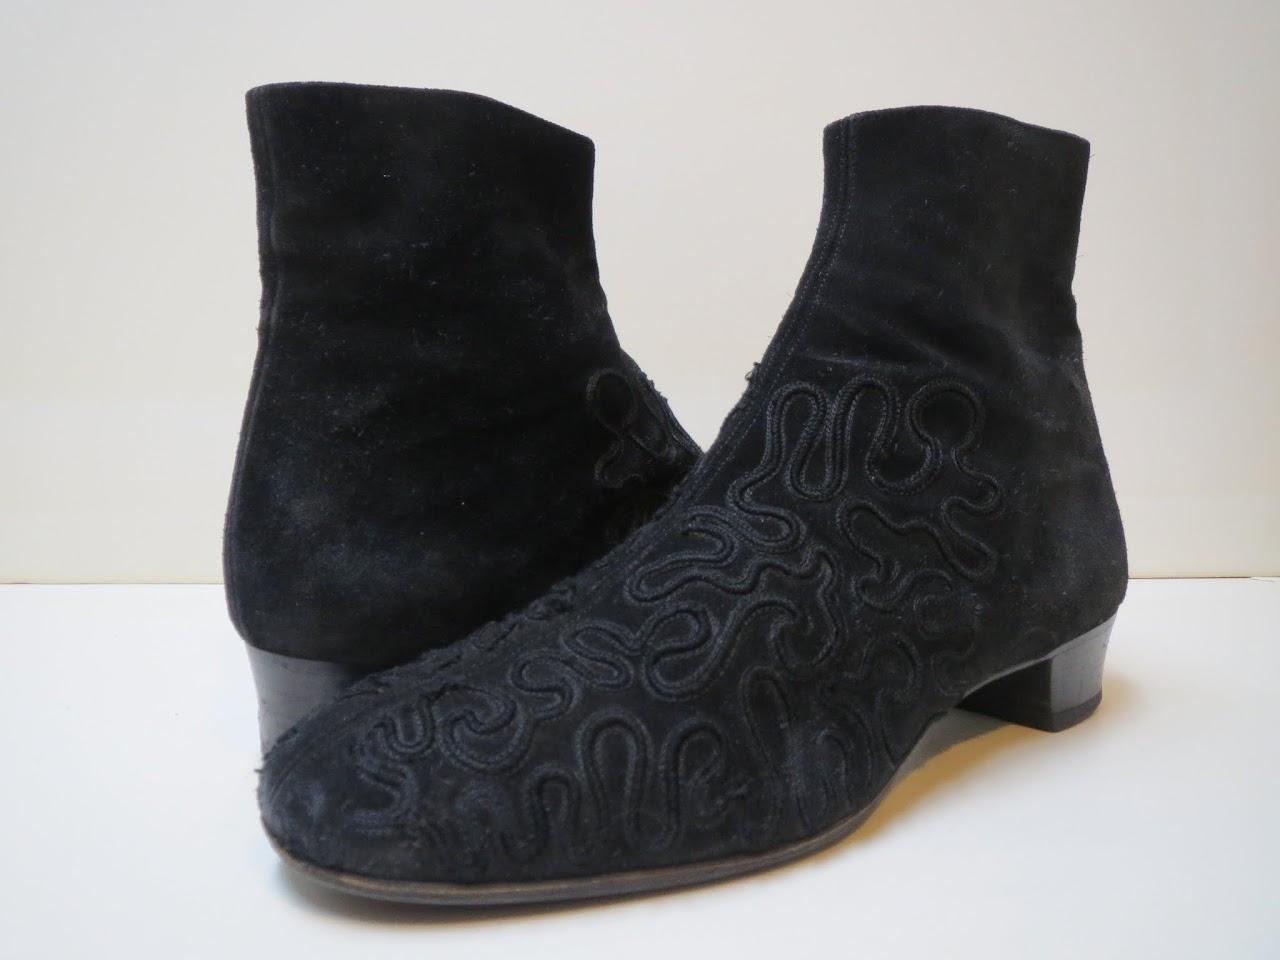 Giorgio Armani Embroidered Ankle Boots